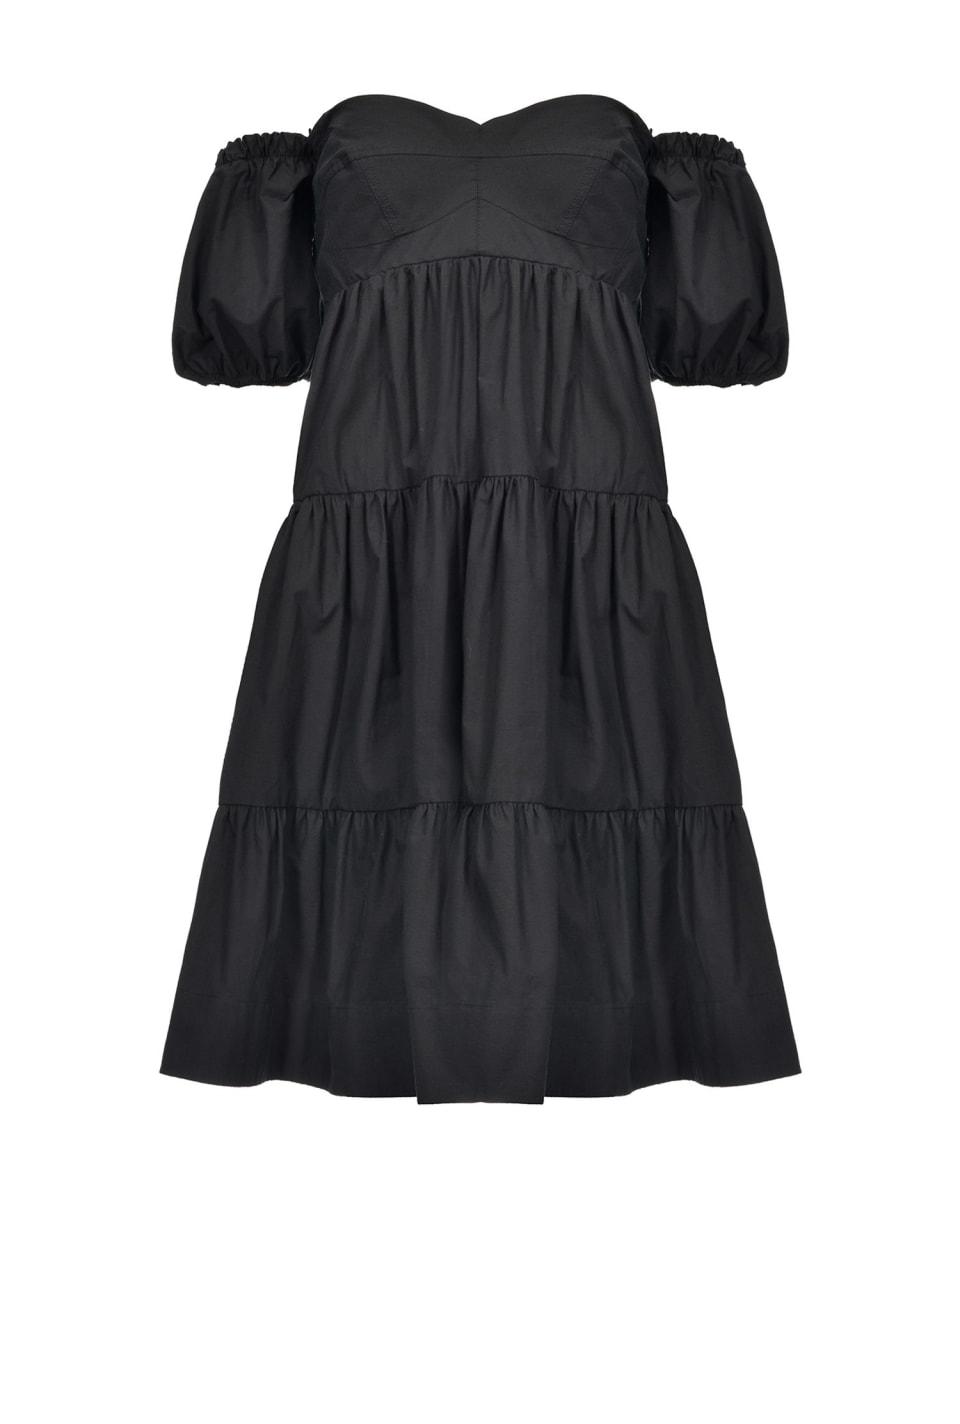 Robe courte volantée